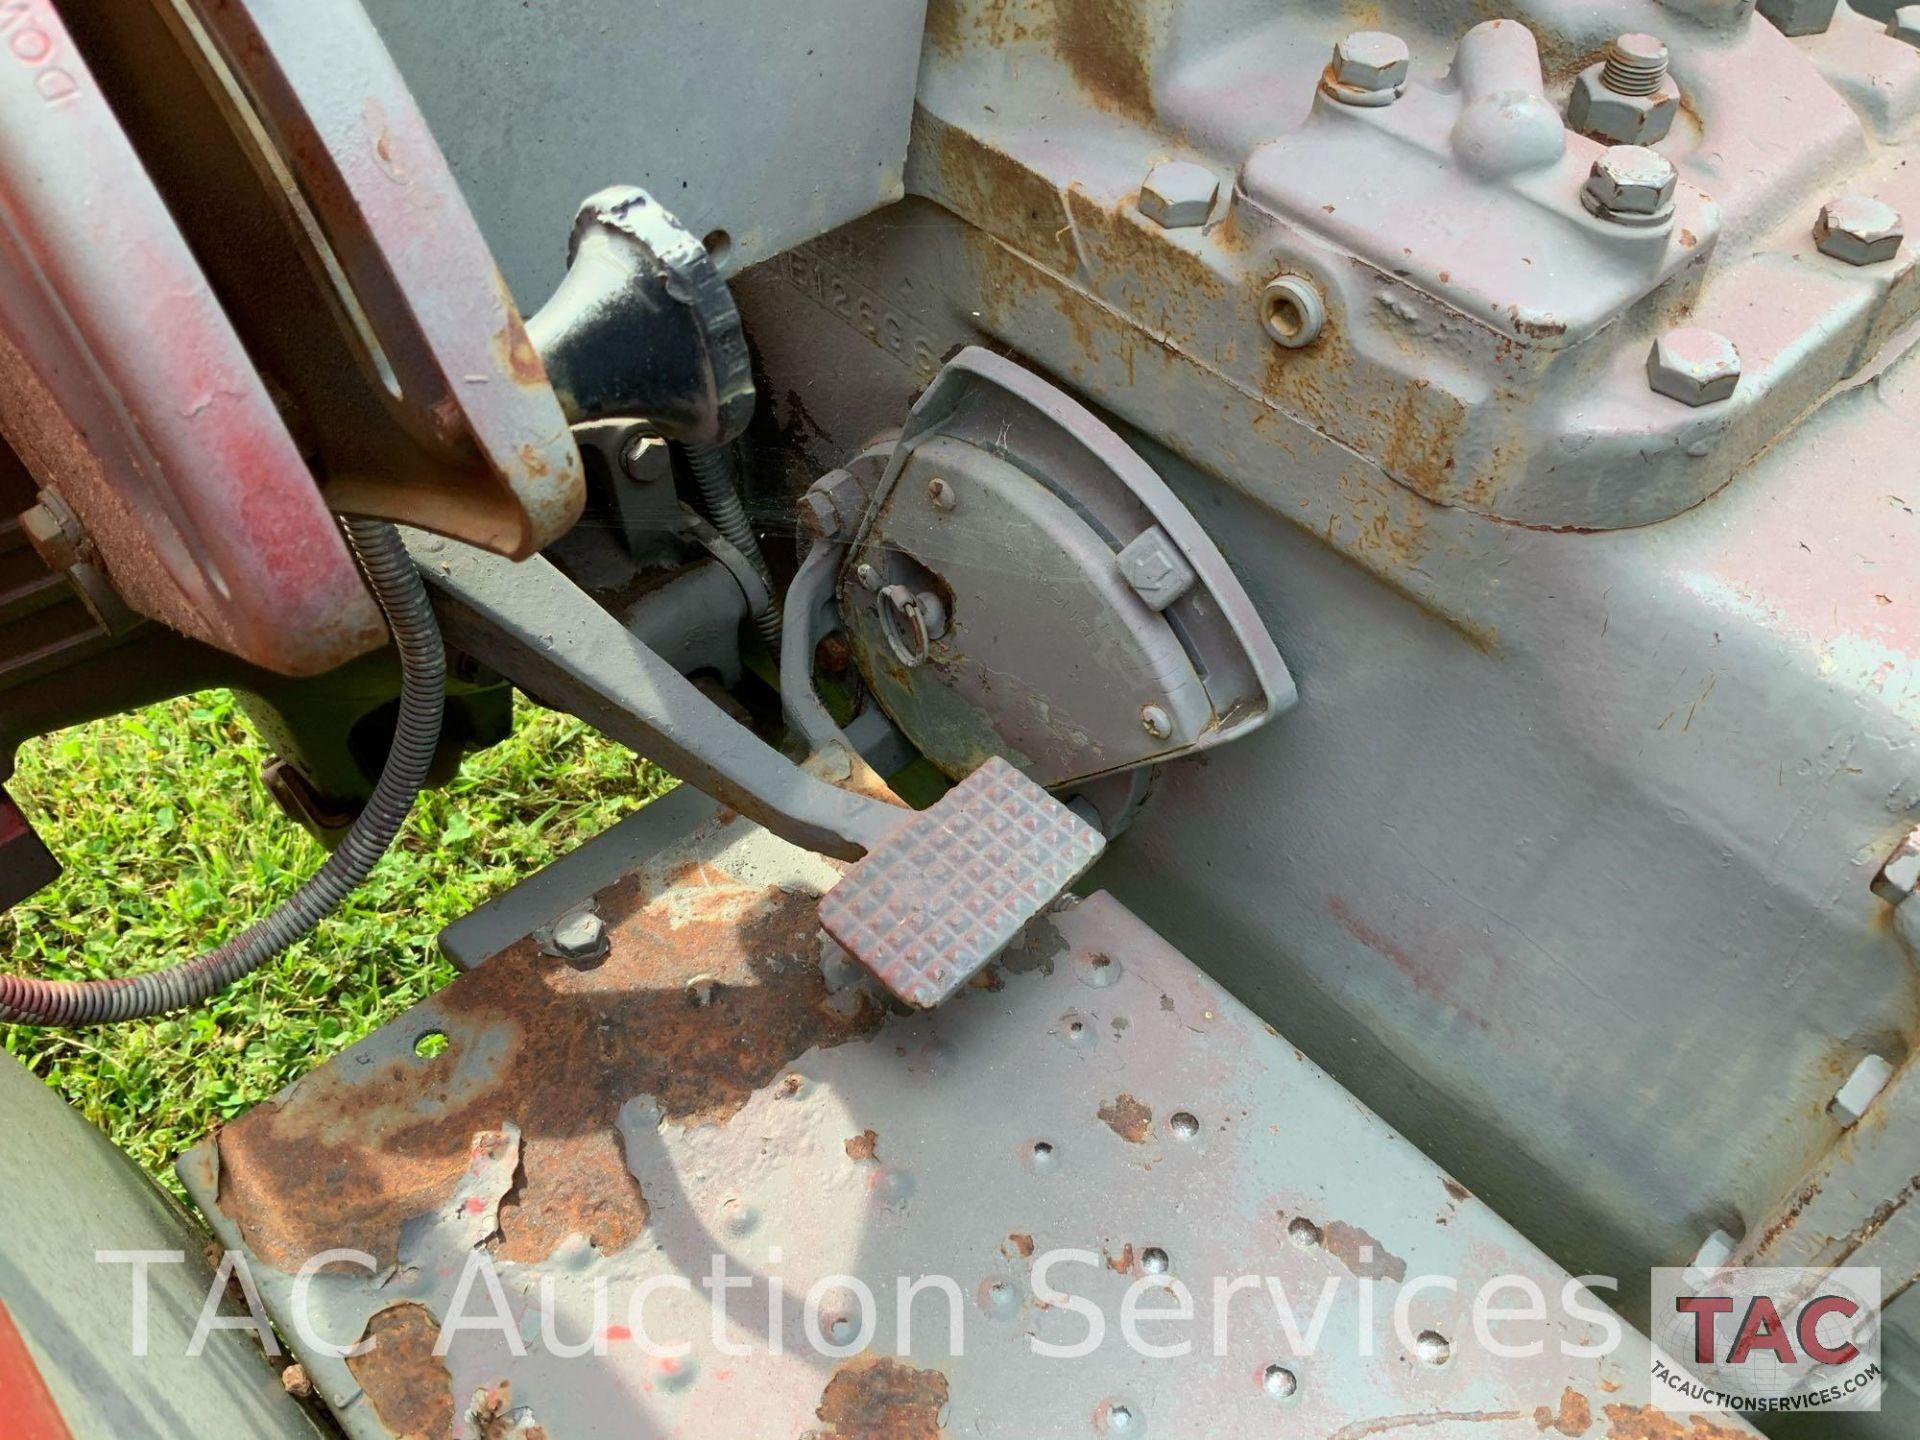 Massey Ferguson 275 Farm Tractor - Image 23 of 25